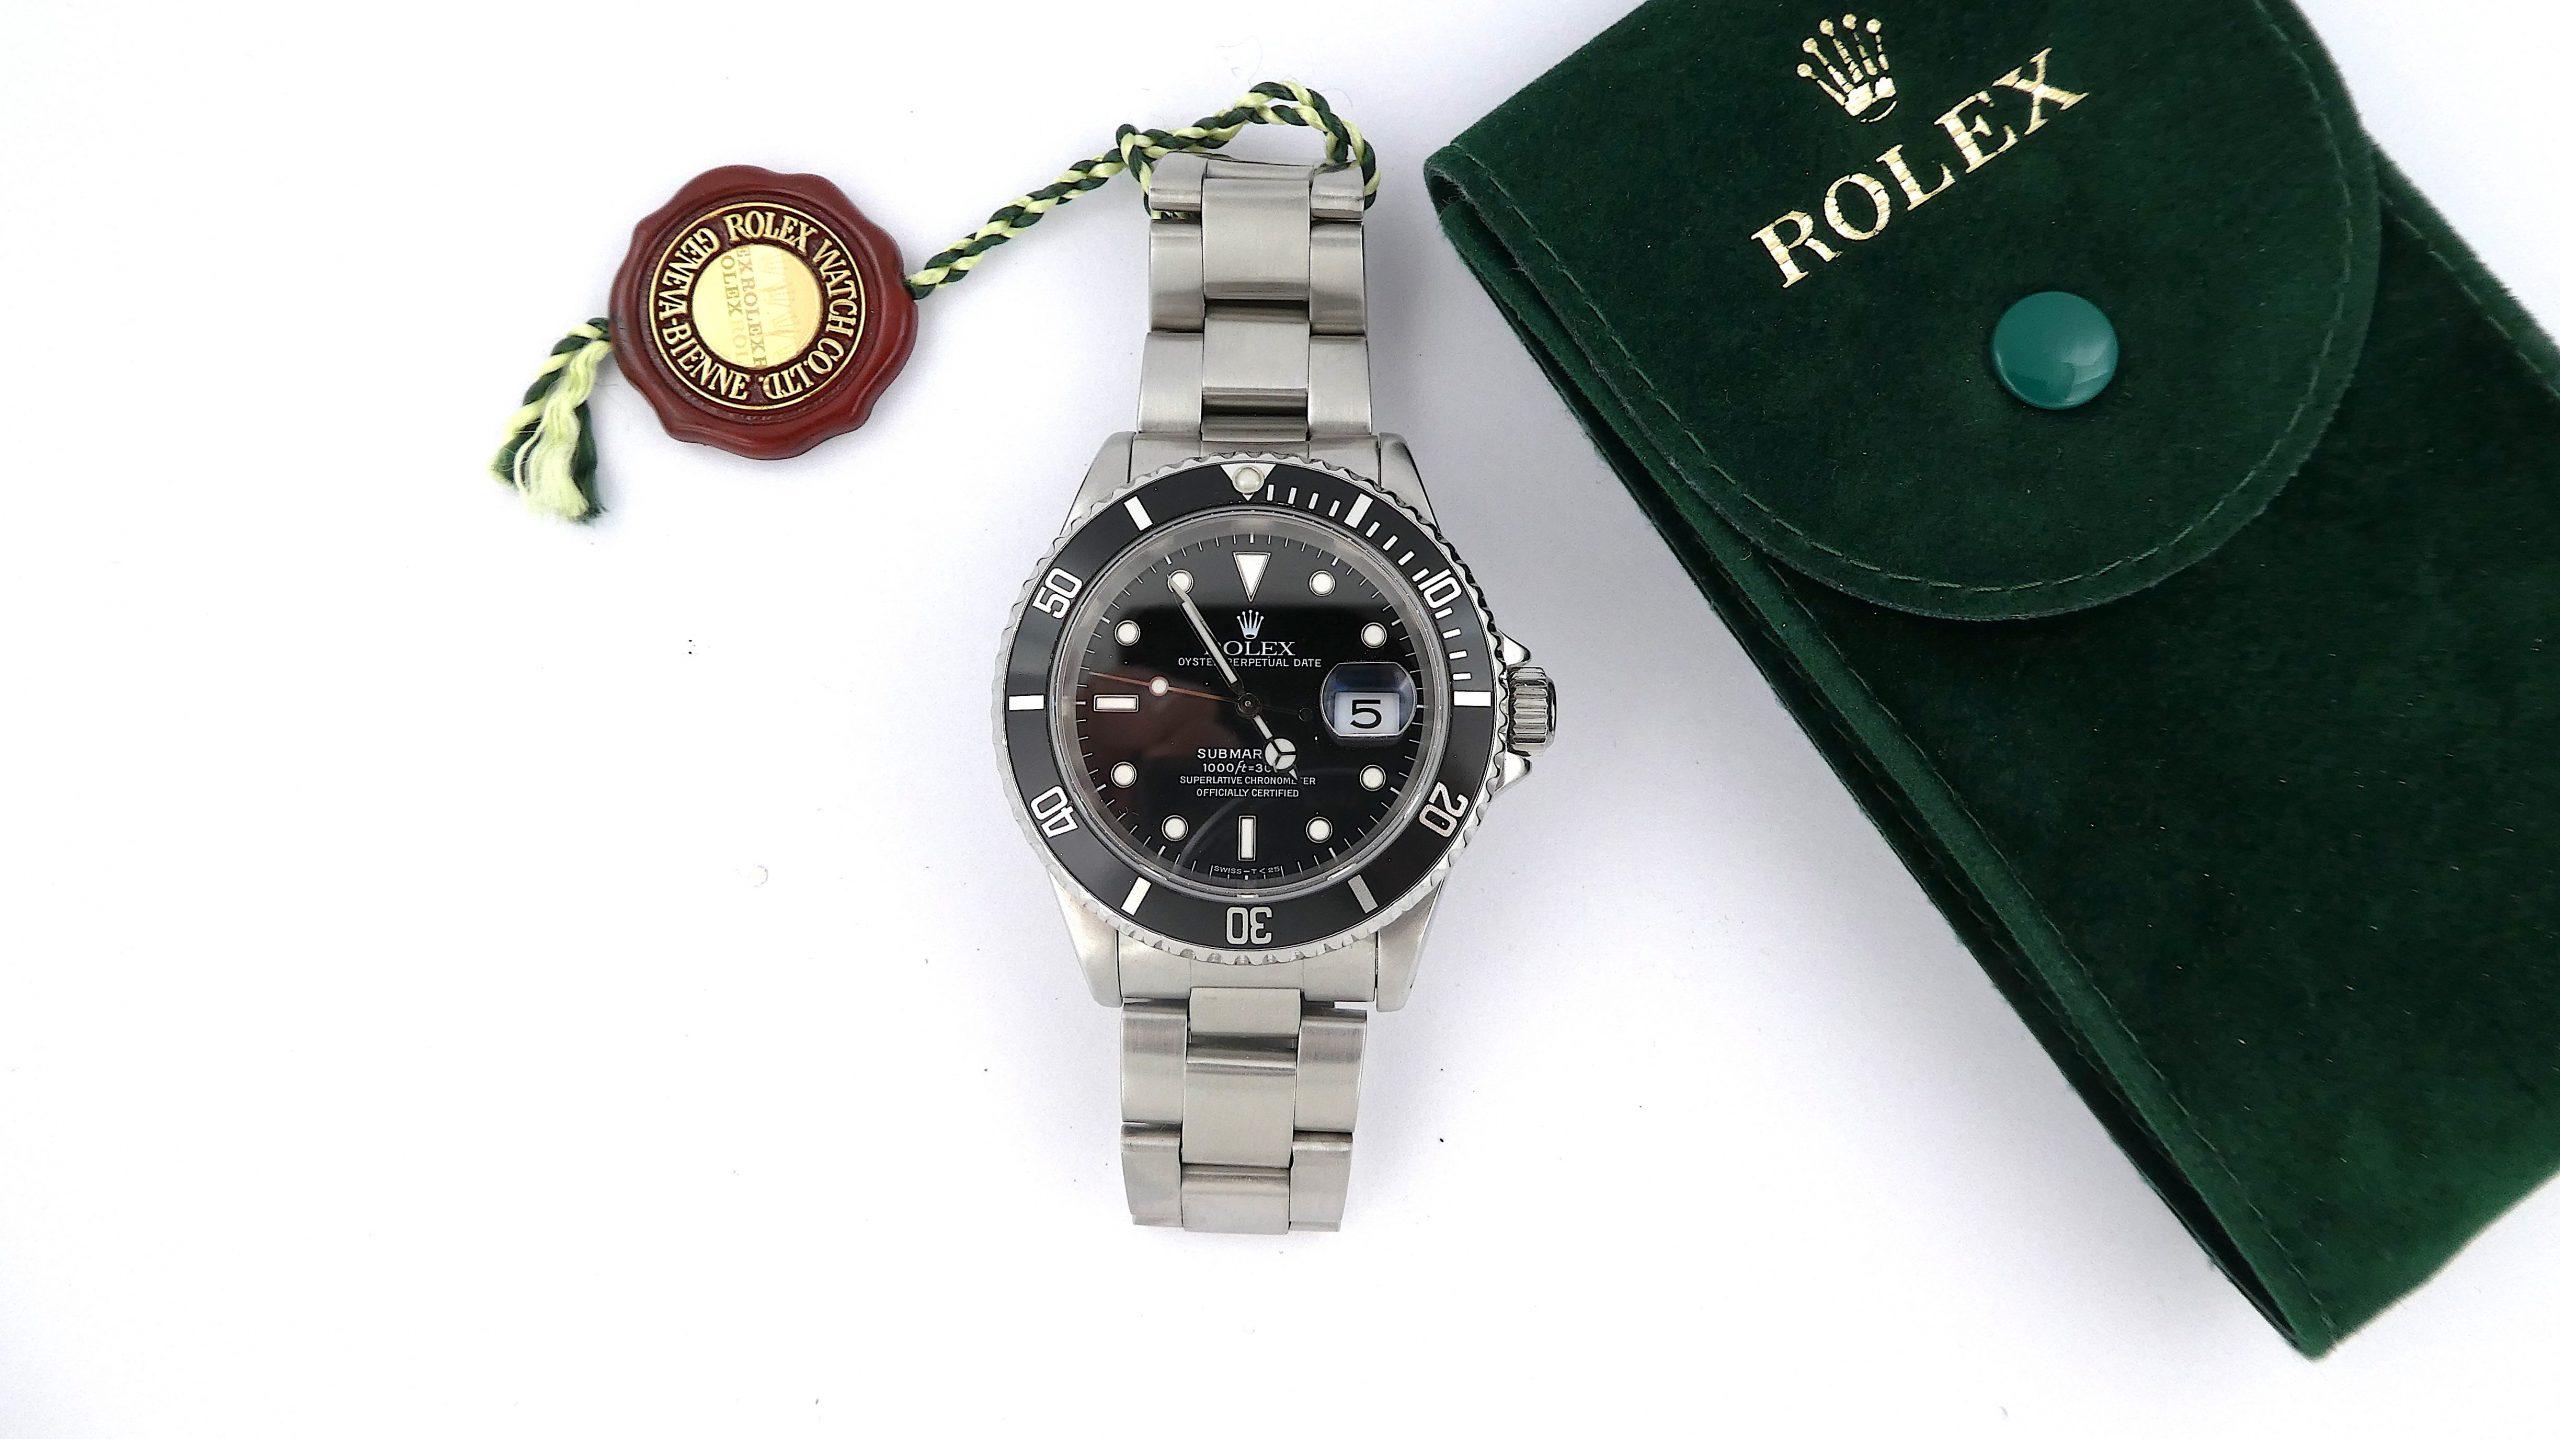 Rolex Submariner Stainless Steel Date